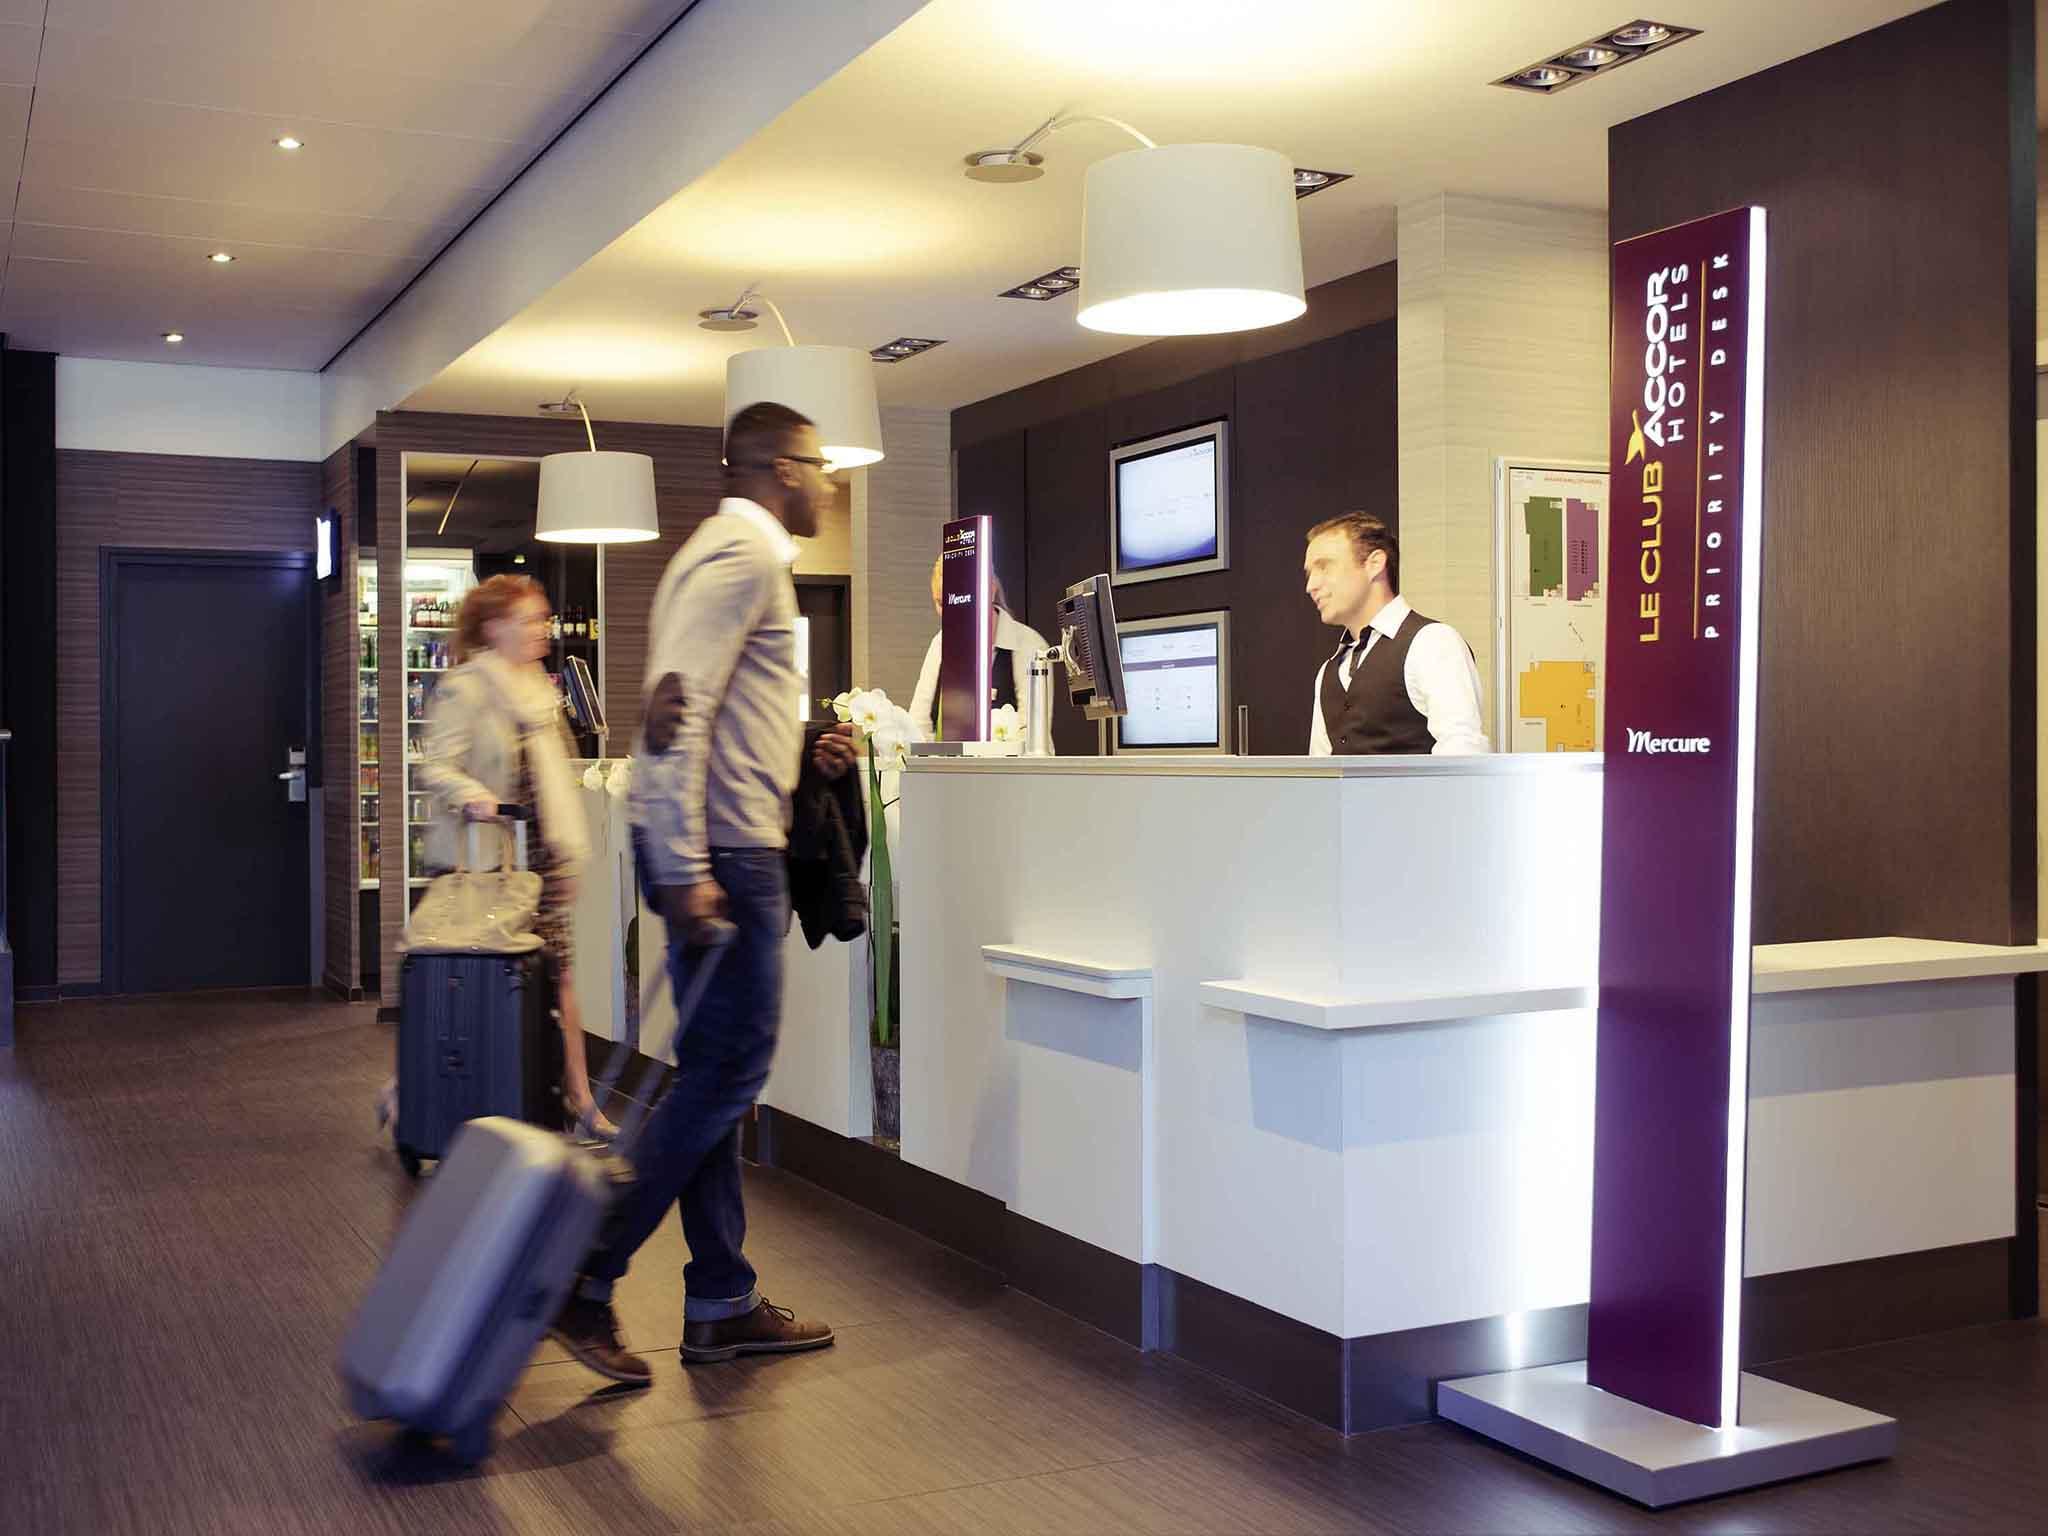 Hotel in DEN HAAG - Mercure Hotel Den Haag Central